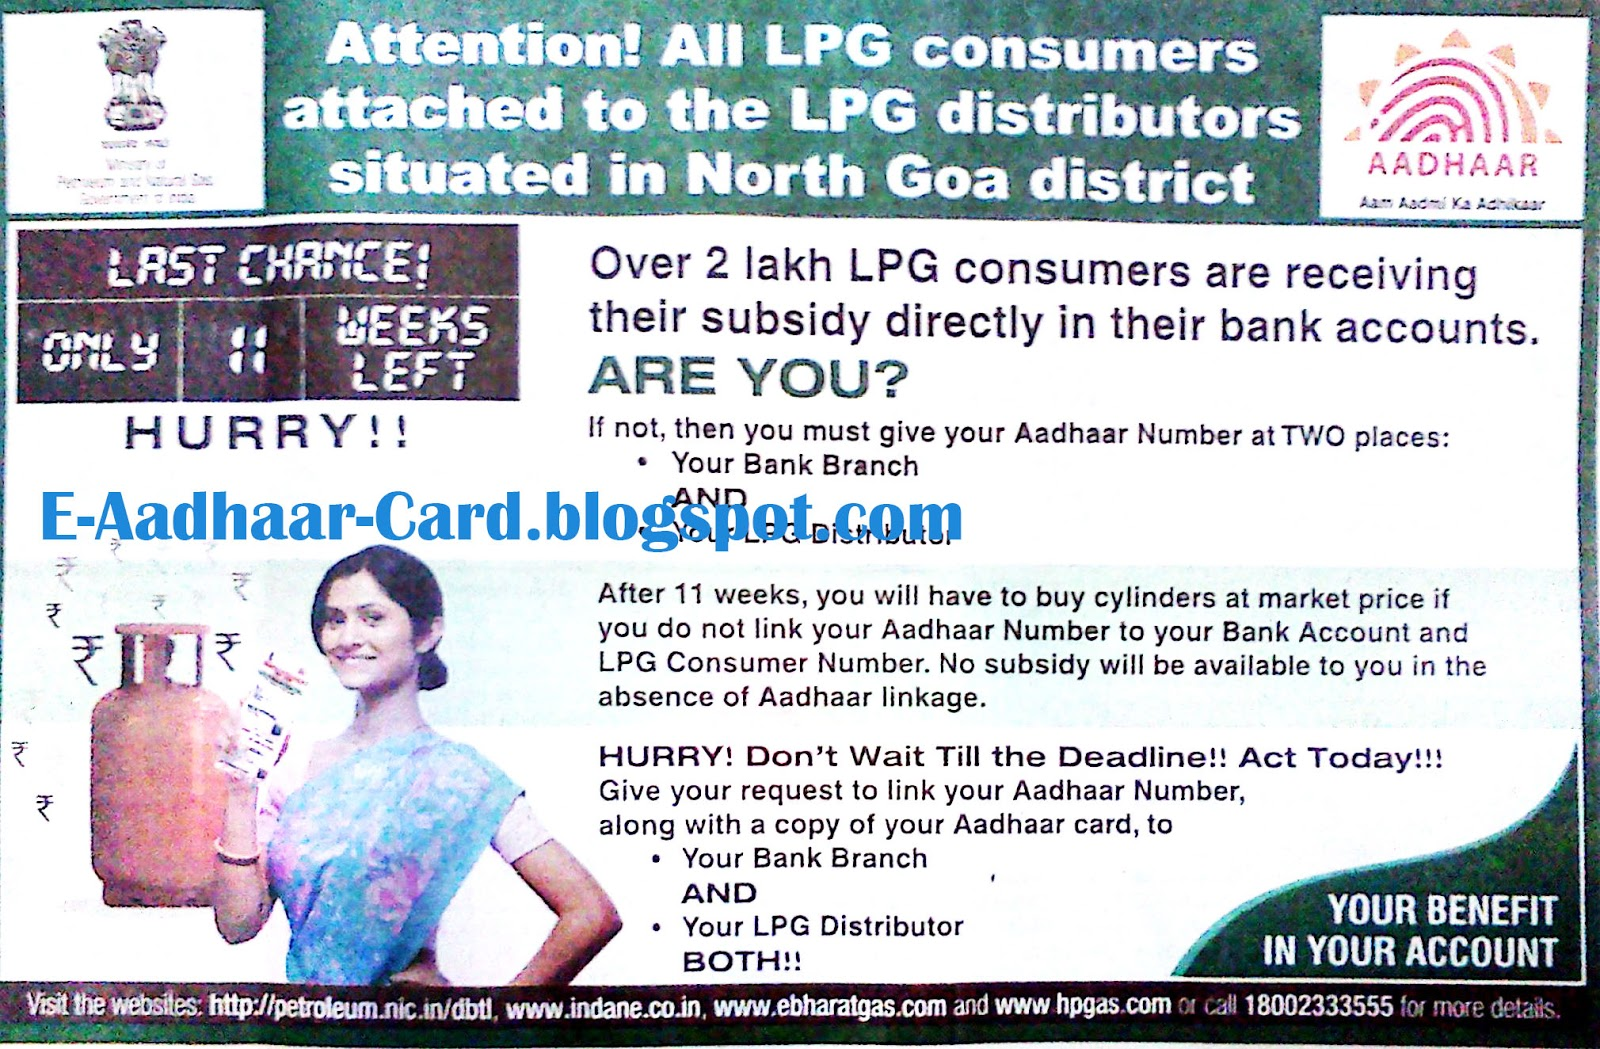 Aadhaar Card for LPG